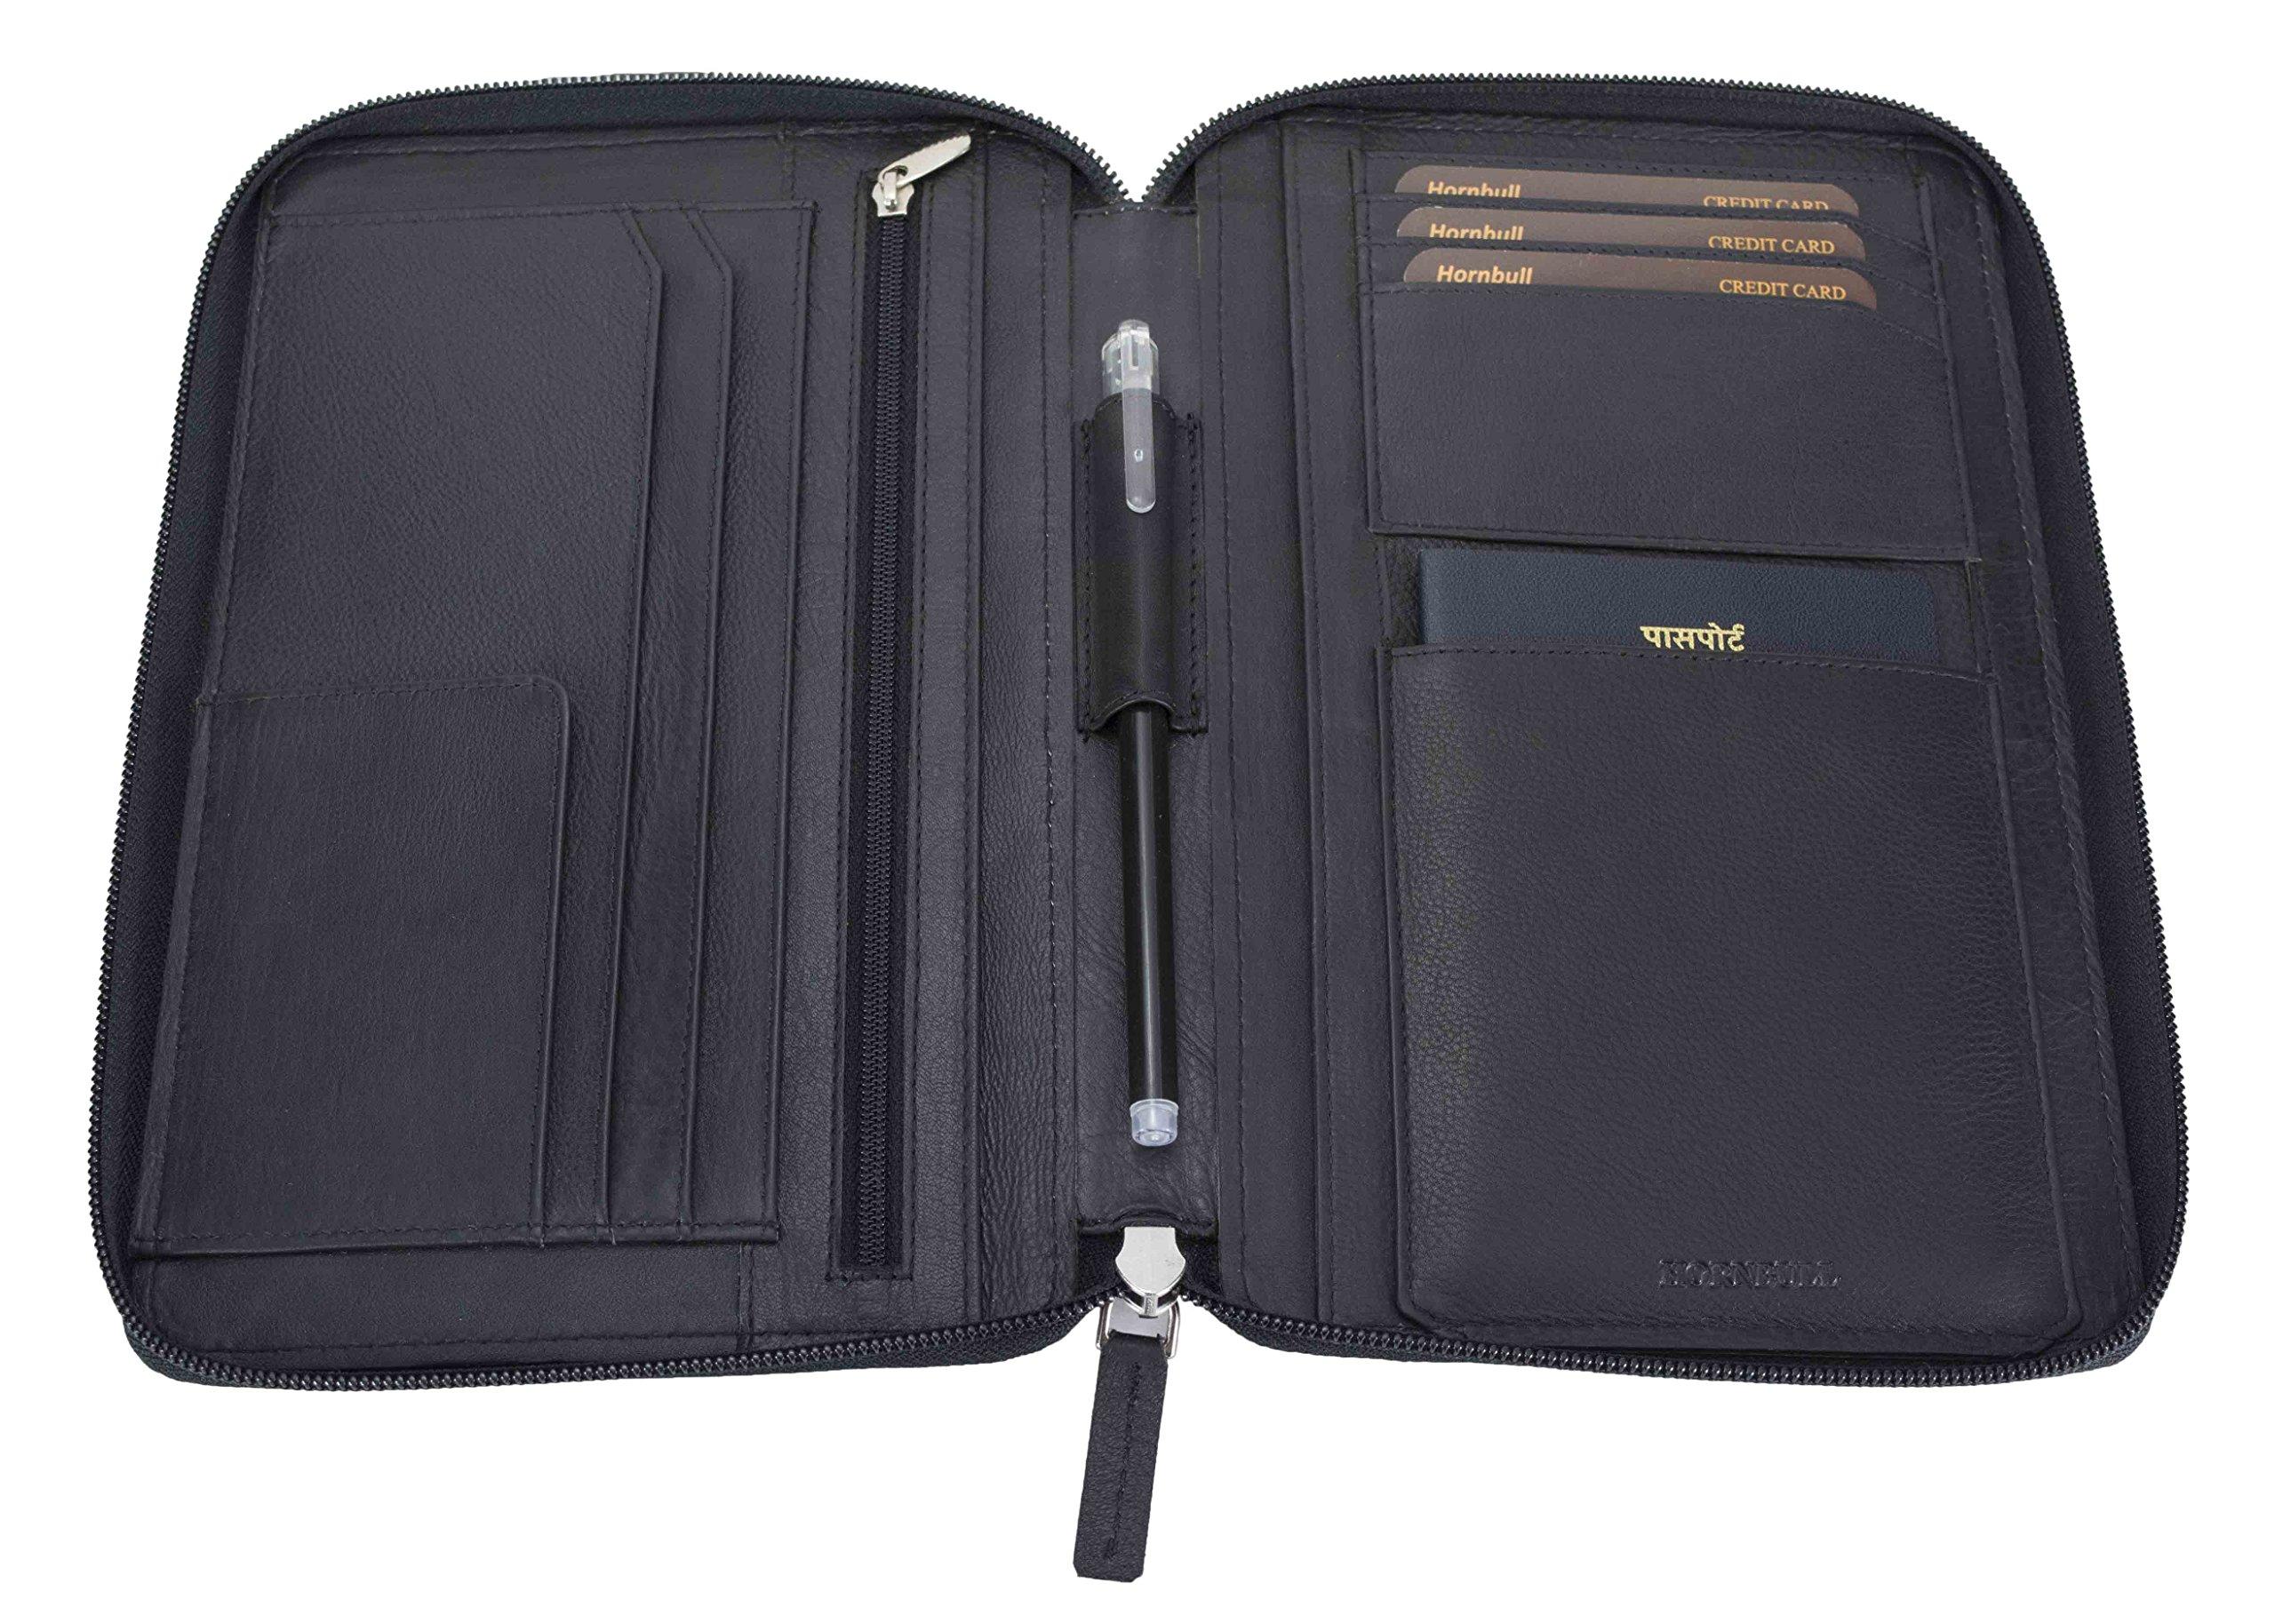 HORNBULL Black Leather Travel Document Holder product image